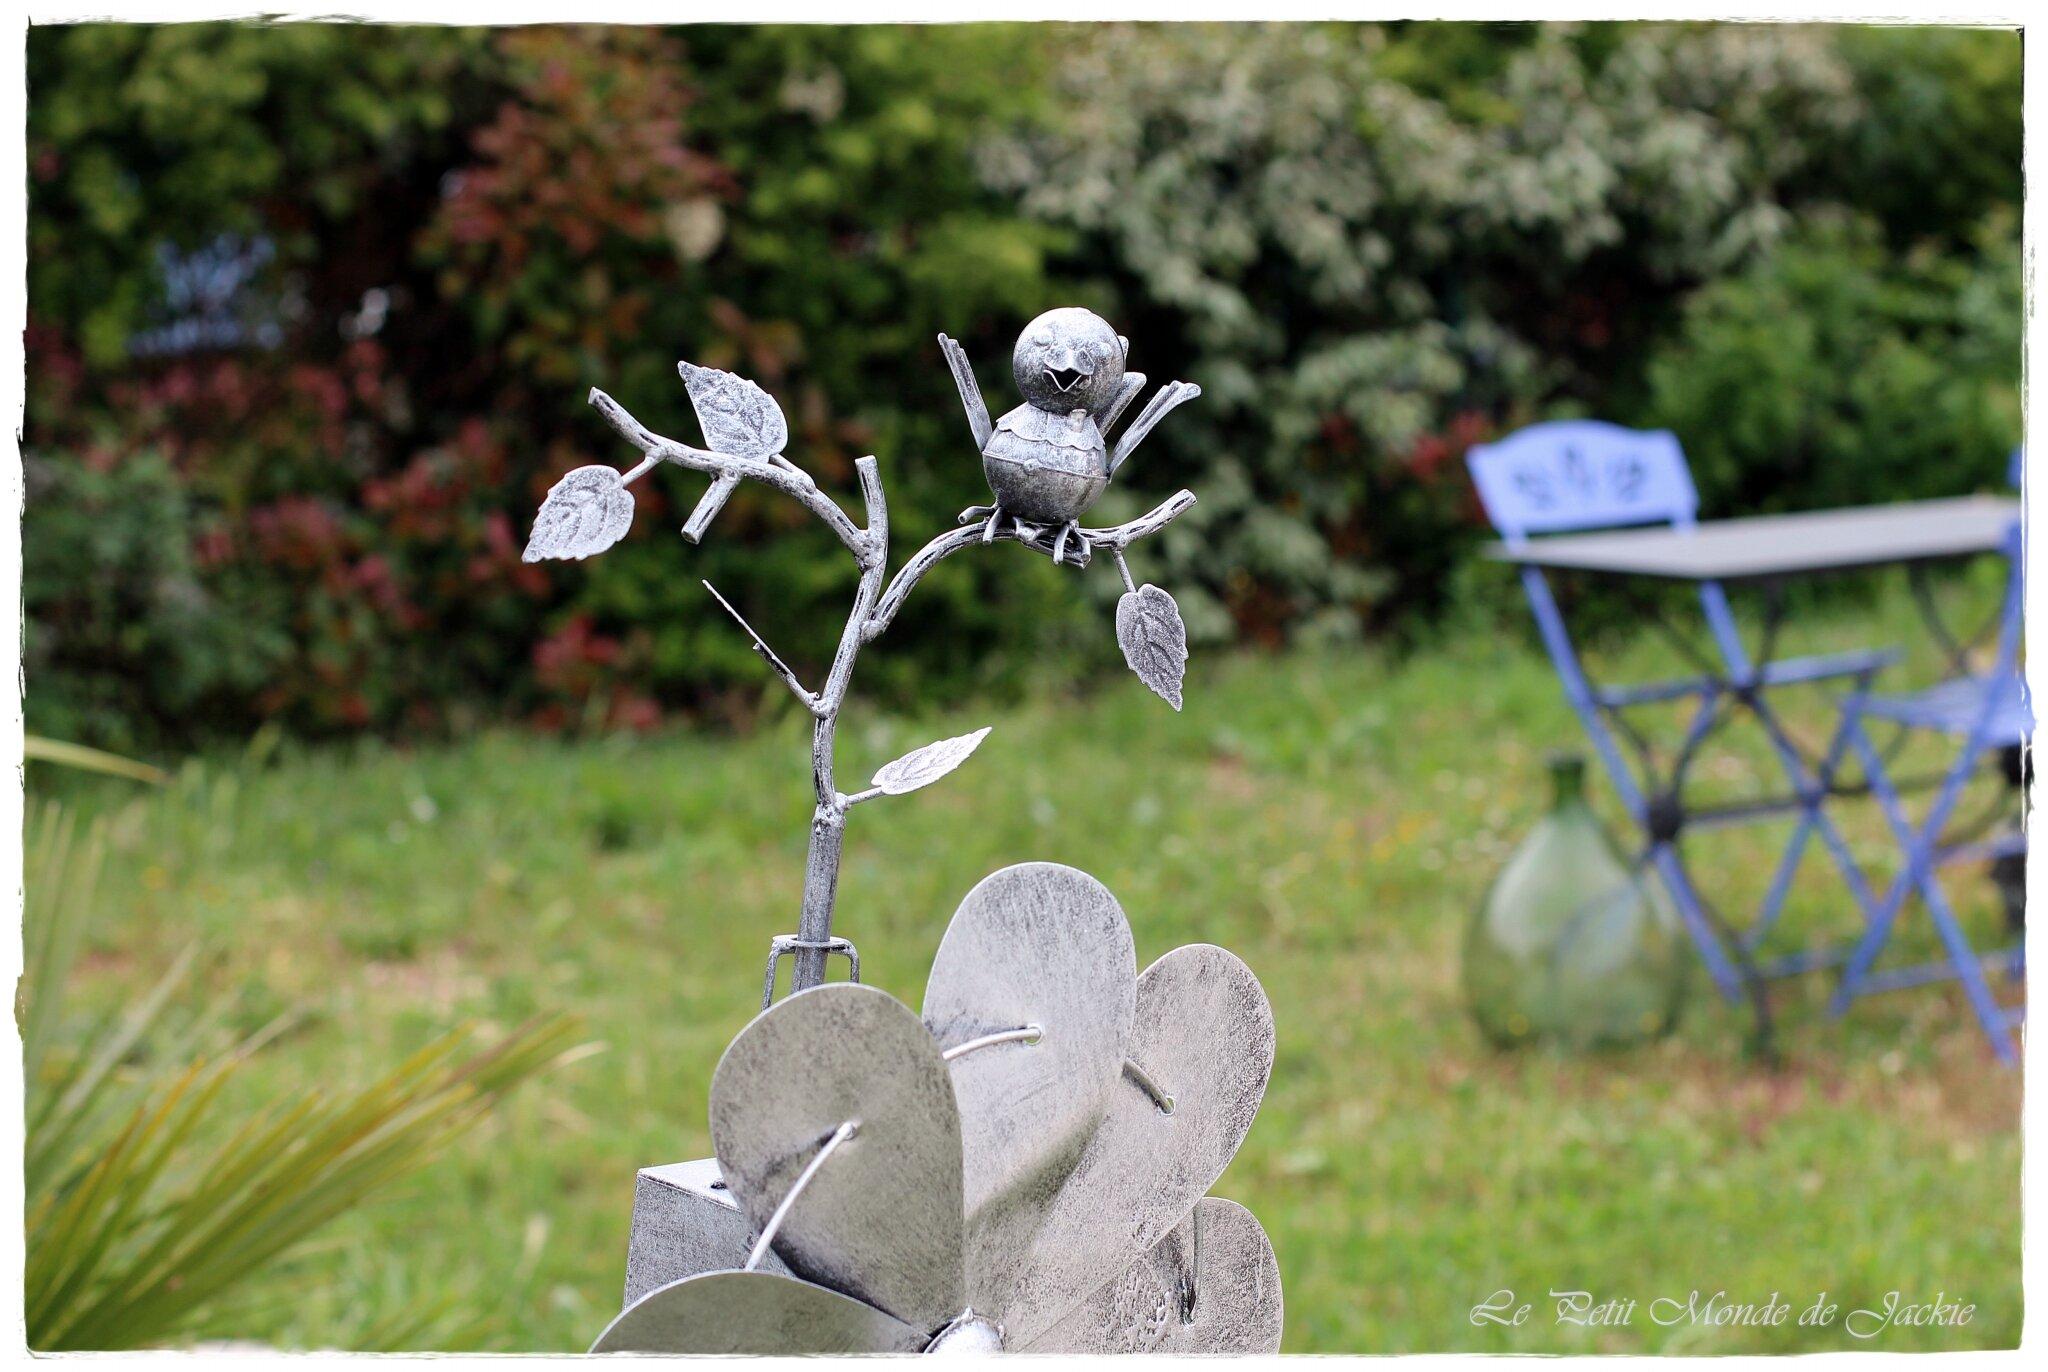 eolienne deco jardin idee deco pour jardin zen with eolienne deco jardin free statue deco. Black Bedroom Furniture Sets. Home Design Ideas